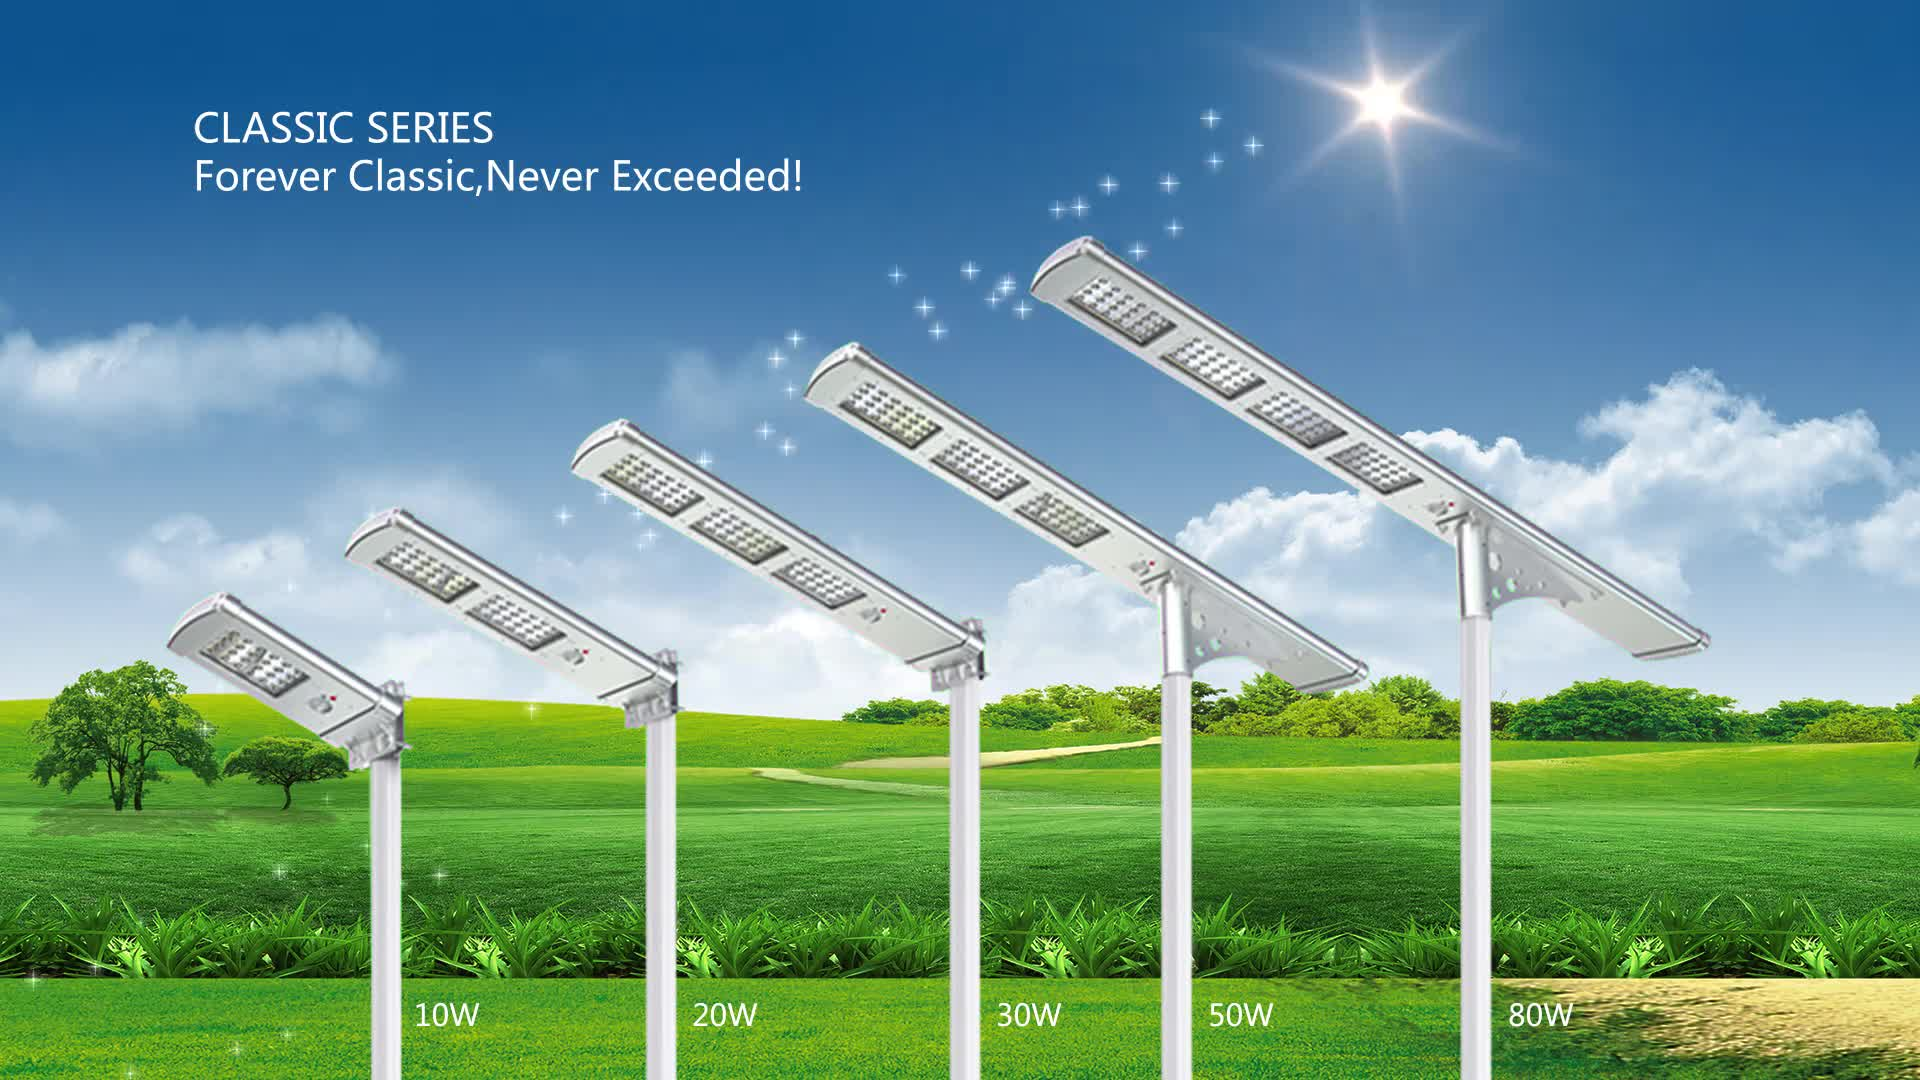 Led Energy Saving Solar Street Light With Motion Sensor